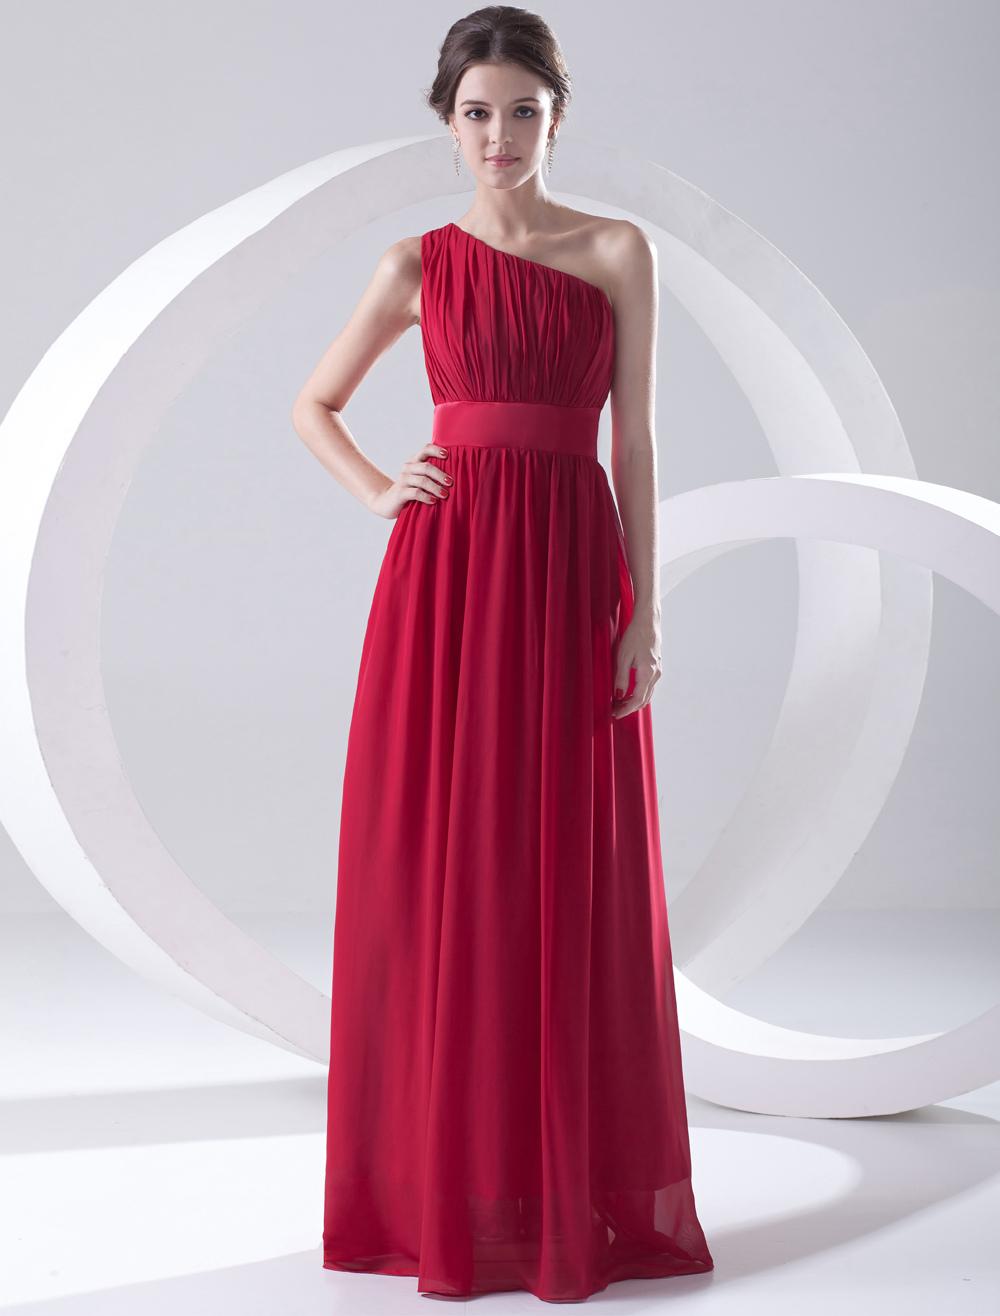 Red Chiffon One-Shoulder Bridesmaid Dress (Wedding Bridesmaid Dresses) photo